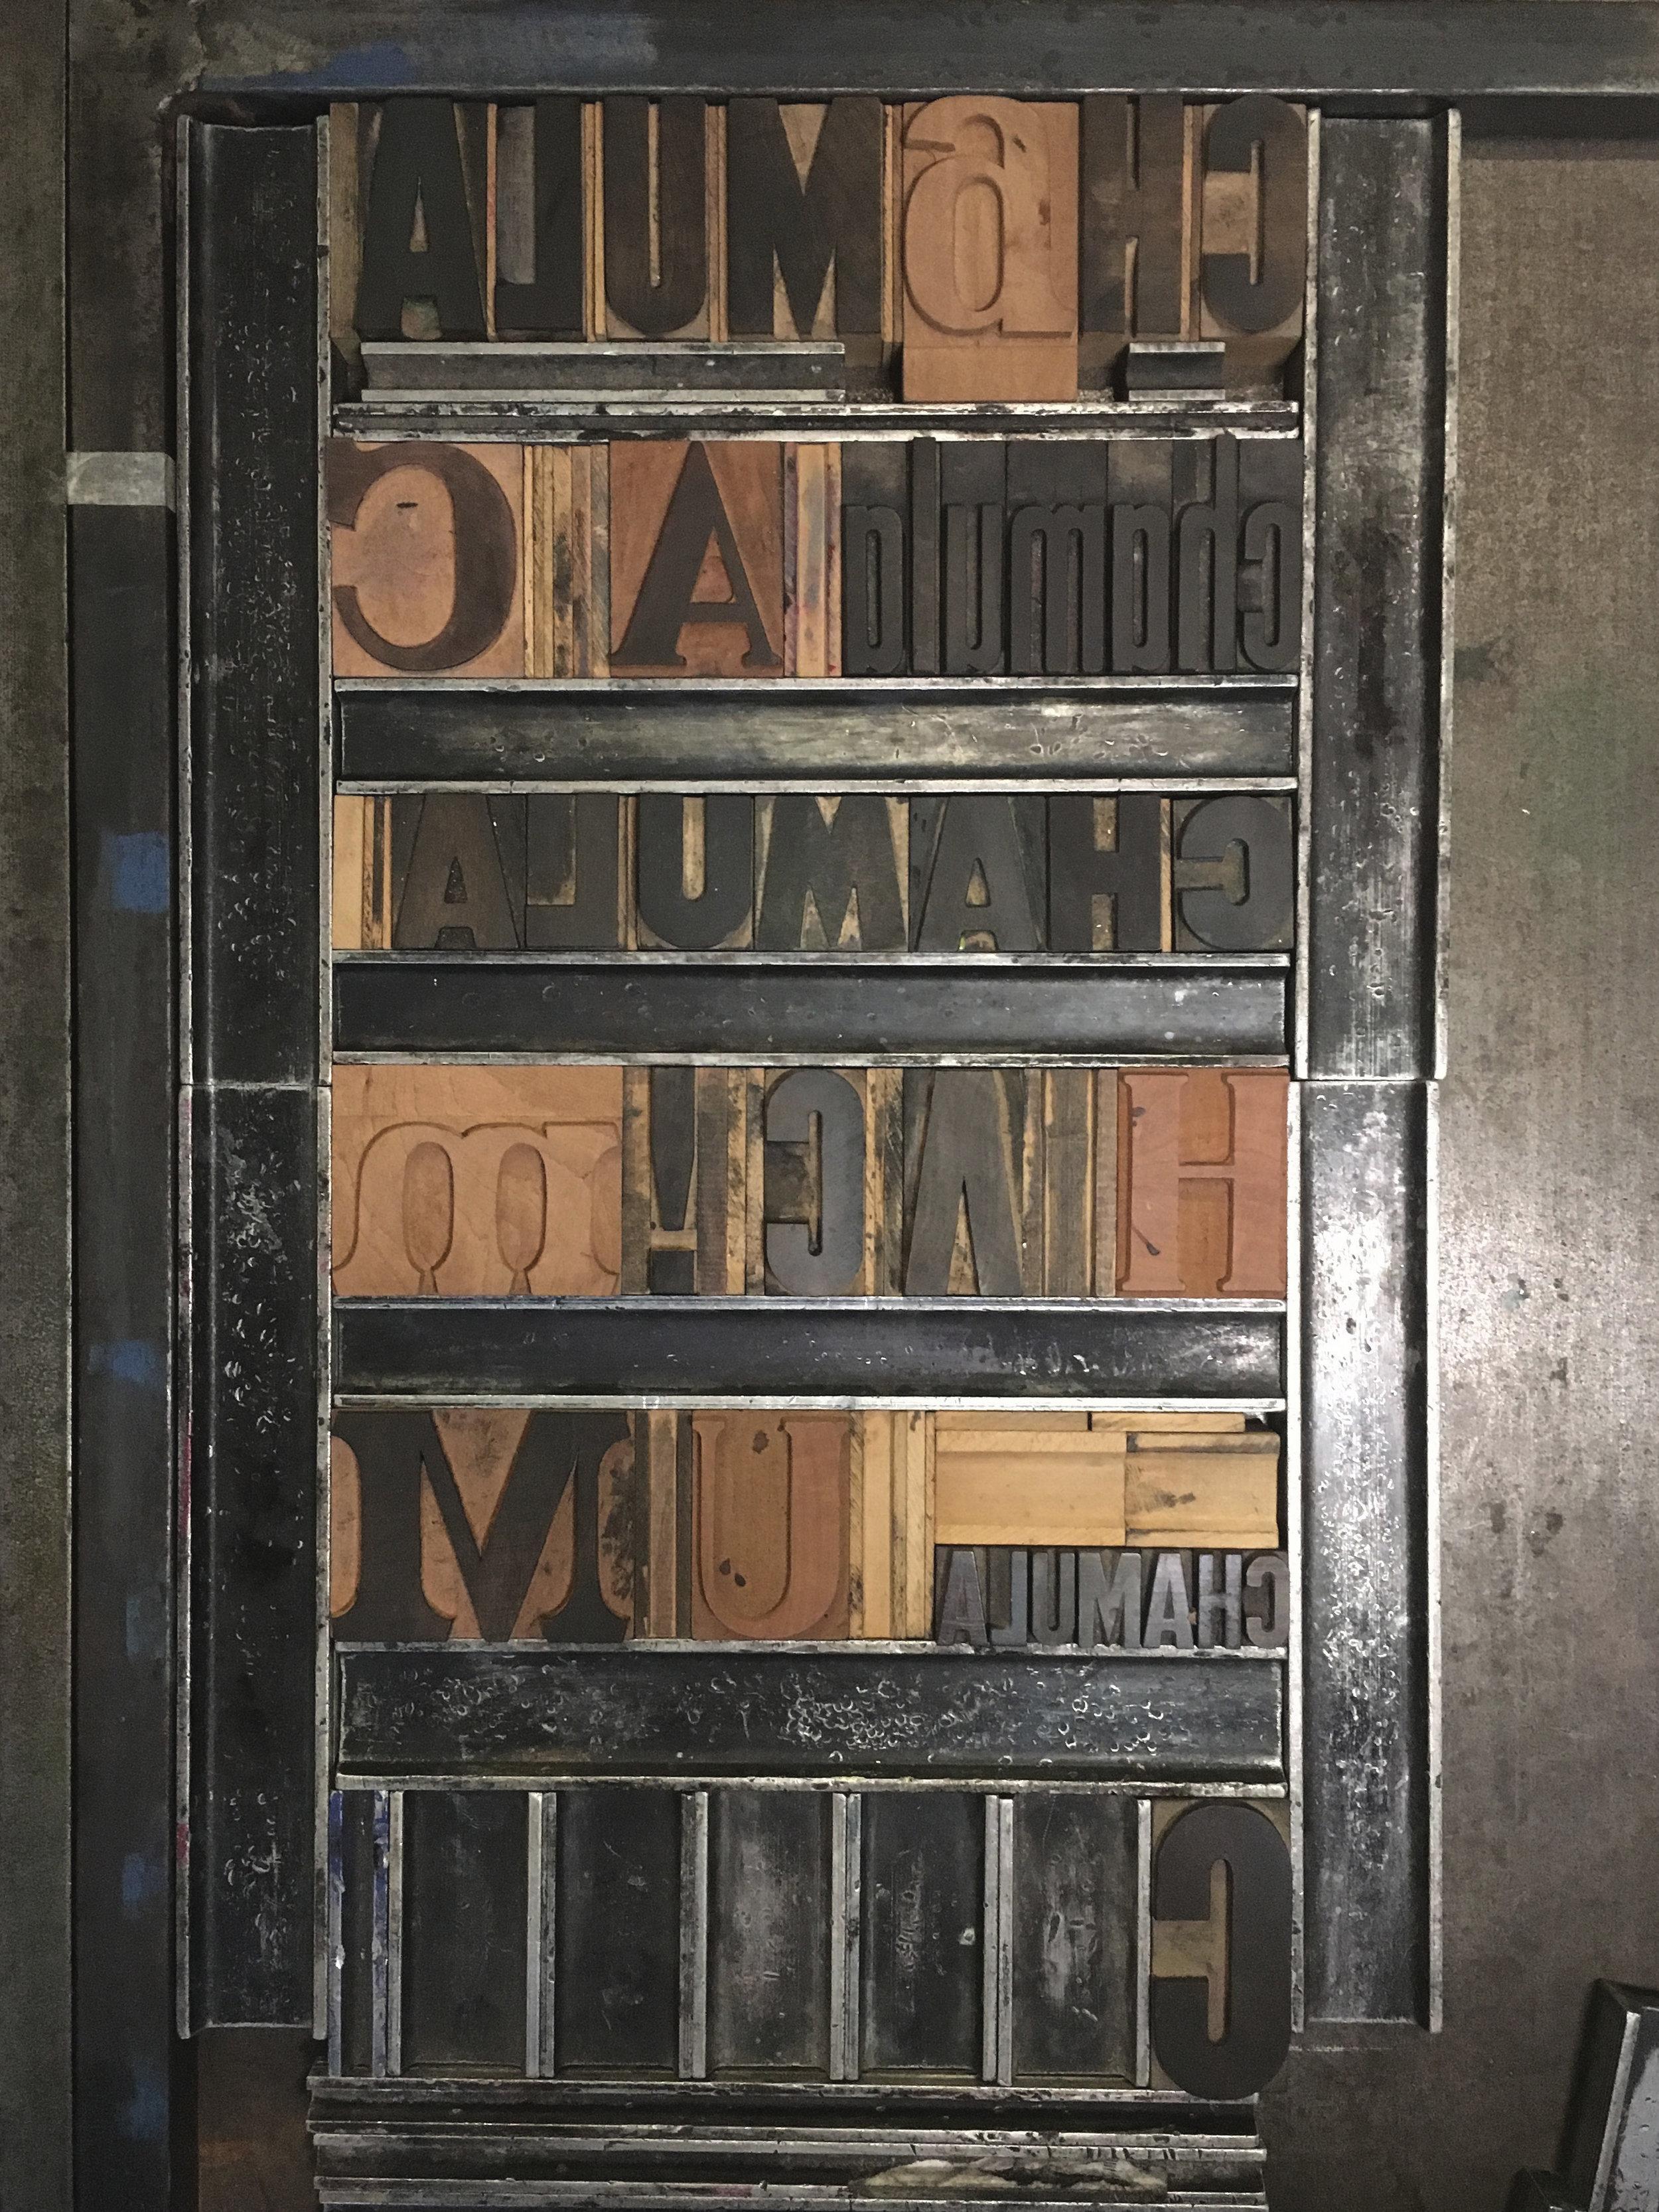 11-personalpress-taller-papel-principal-letterpress-imprenta-tipografica-1.jpg